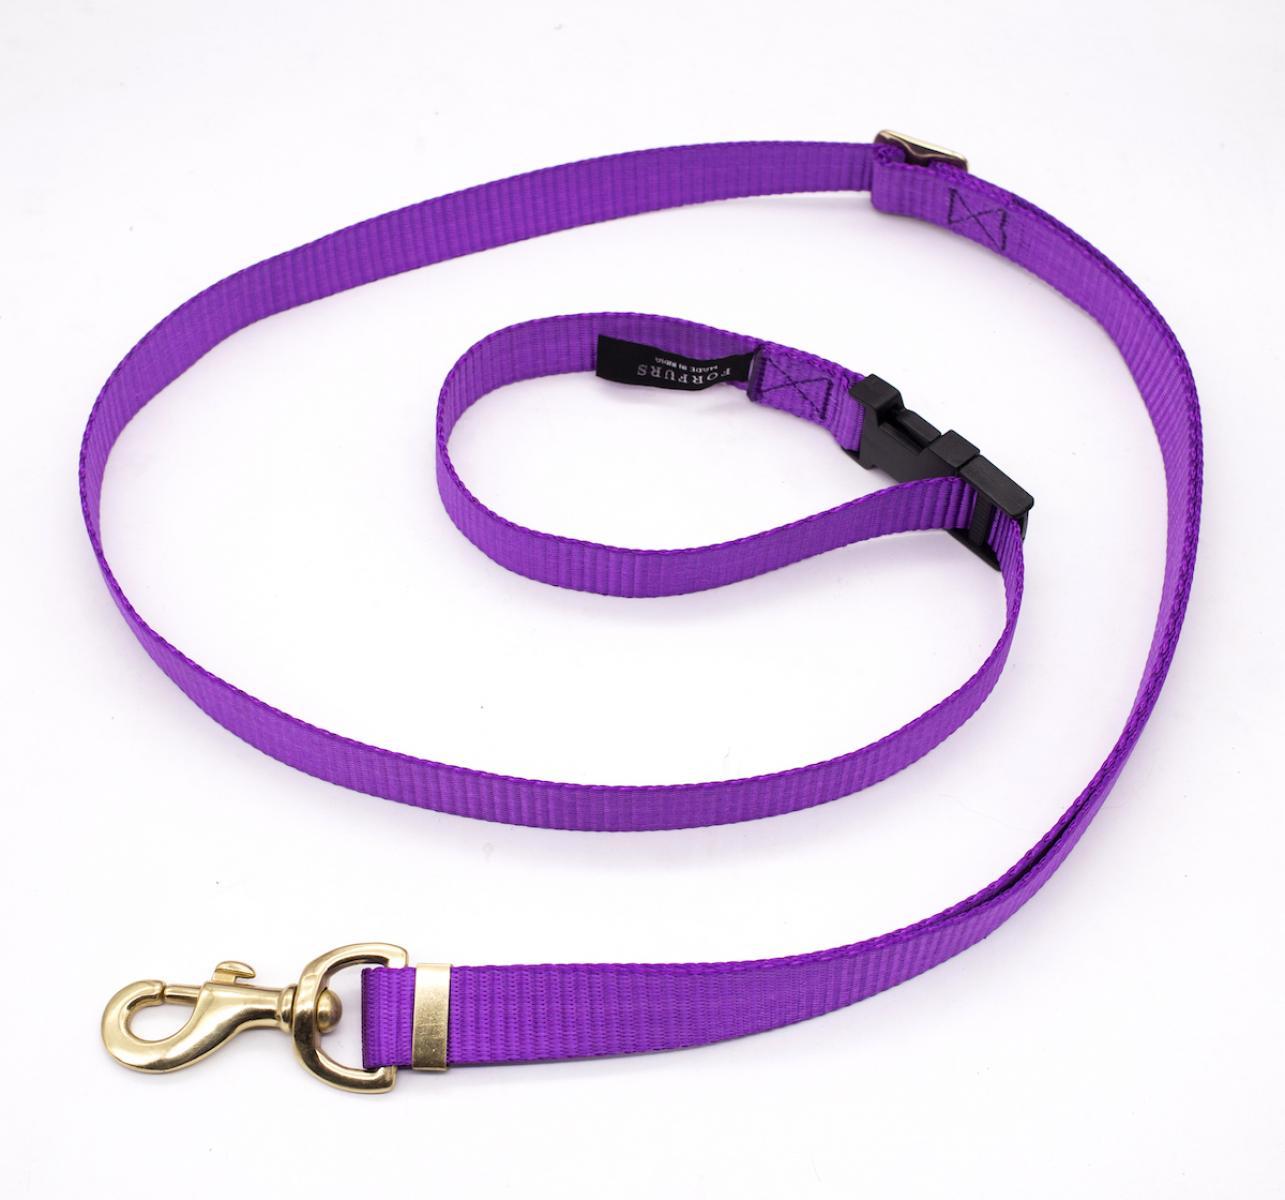 Forfurs Adjustable Protean All Breed Leash - Ultra Violet